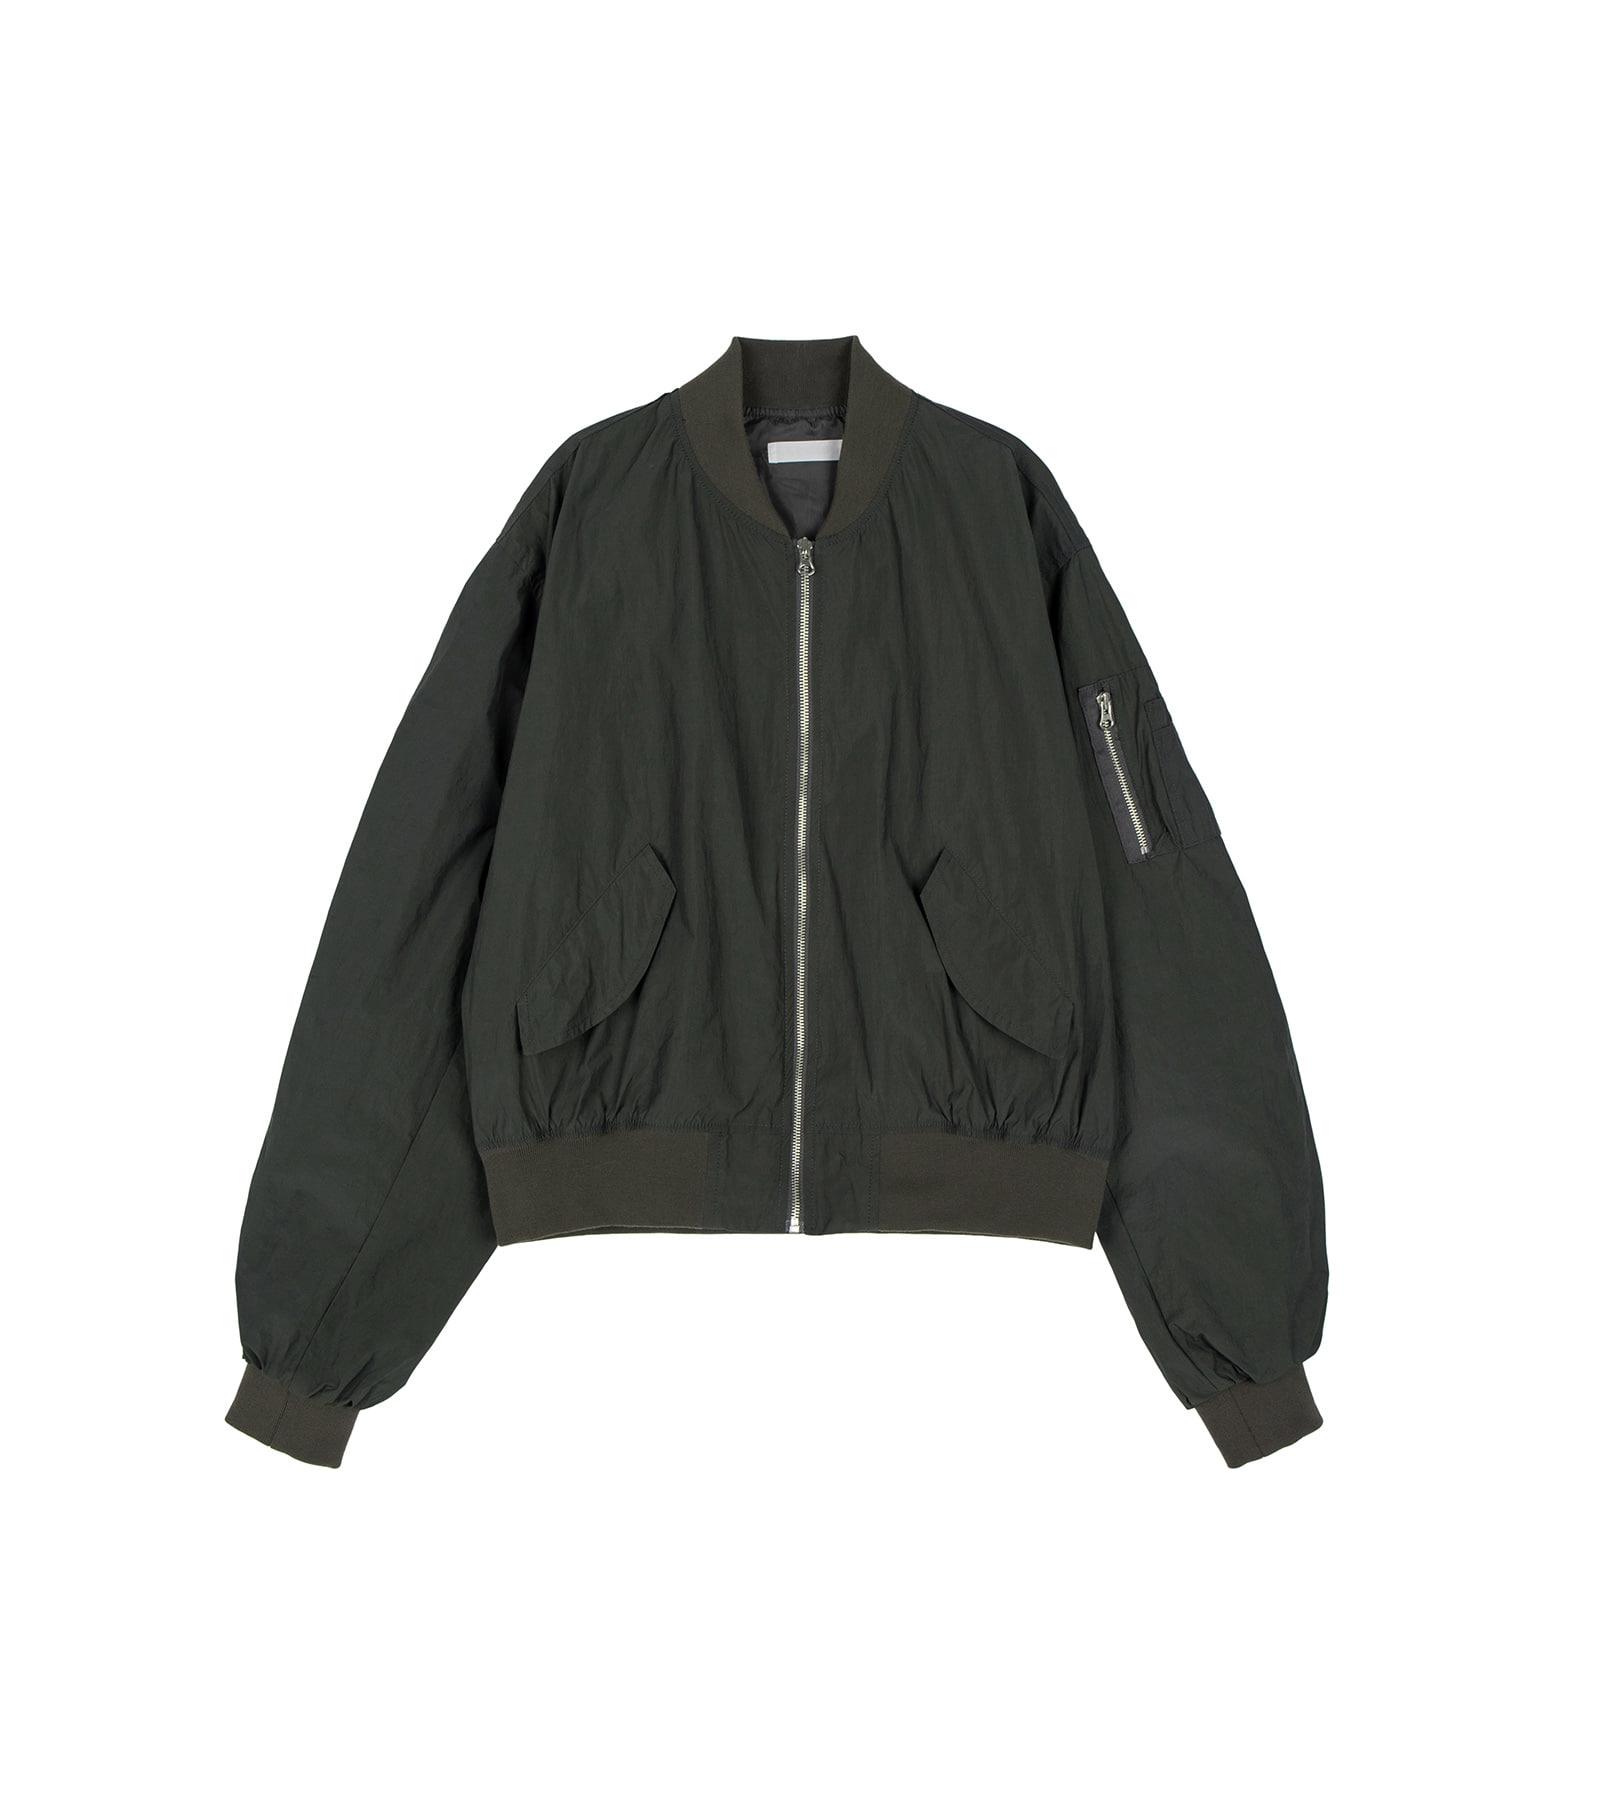 Trans-over bomber jacket